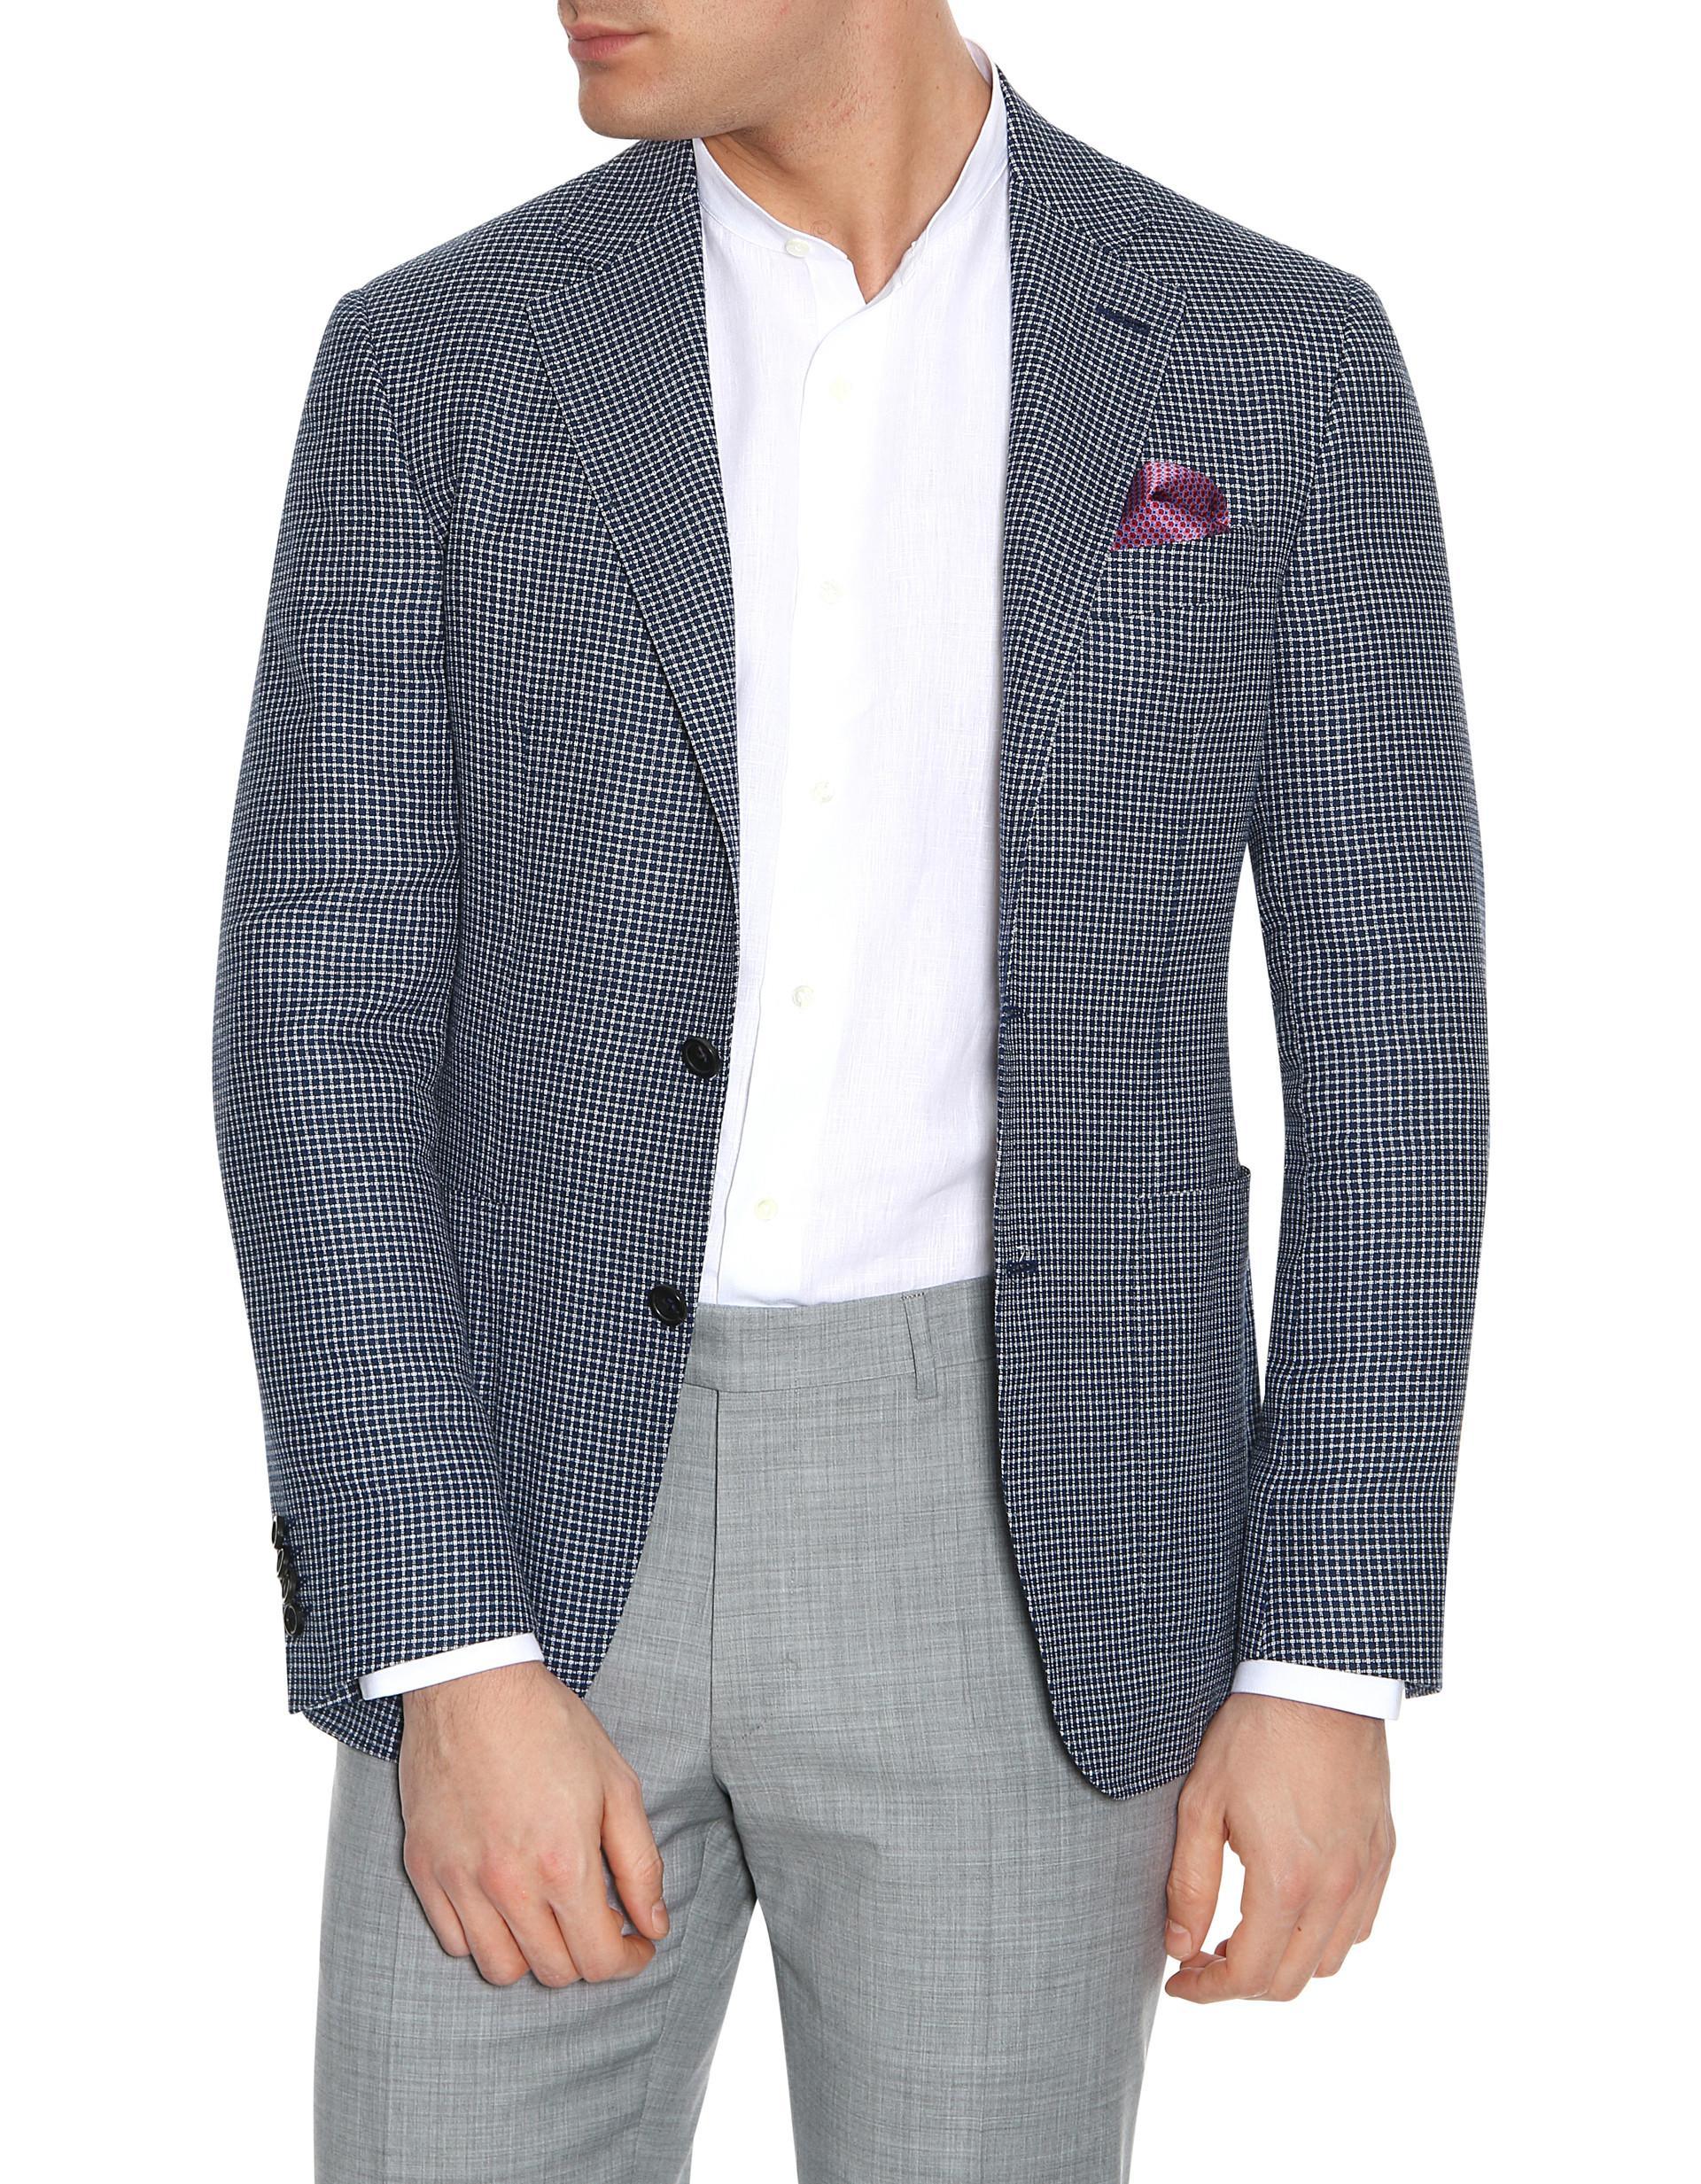 da6bfd8d2ba Canali Kei checked regularfit wool blazer t